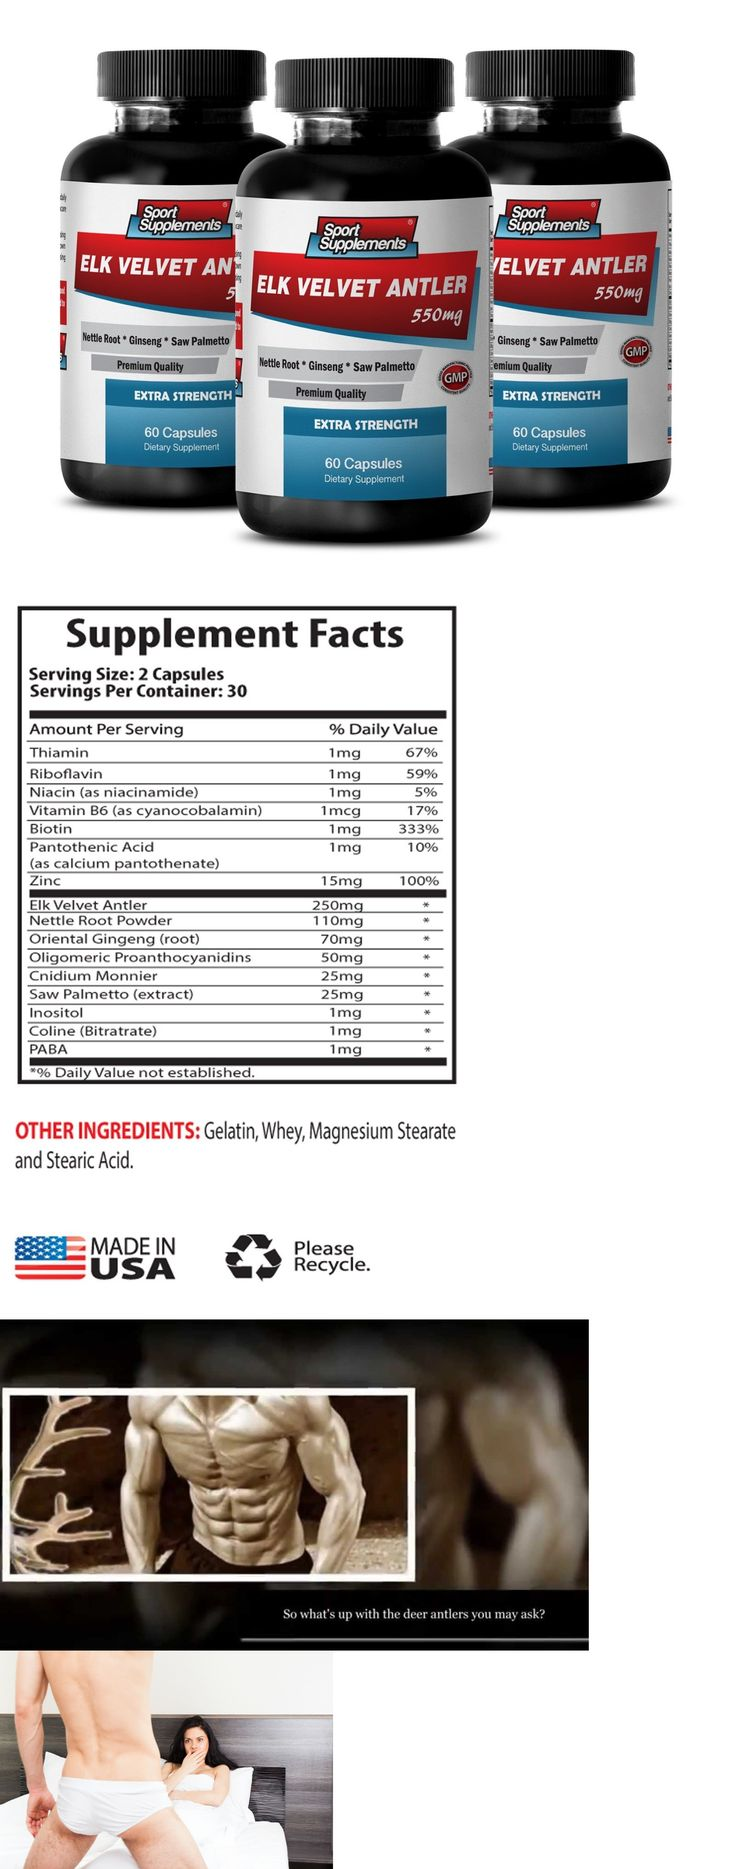 Sports Diet and Weight Loss: Raise Testosterone Level Capsule - Elk Velvet Antler 550Mg - Deer Powder 3B -> BUY IT NOW ONLY: $44.95 on eBay!